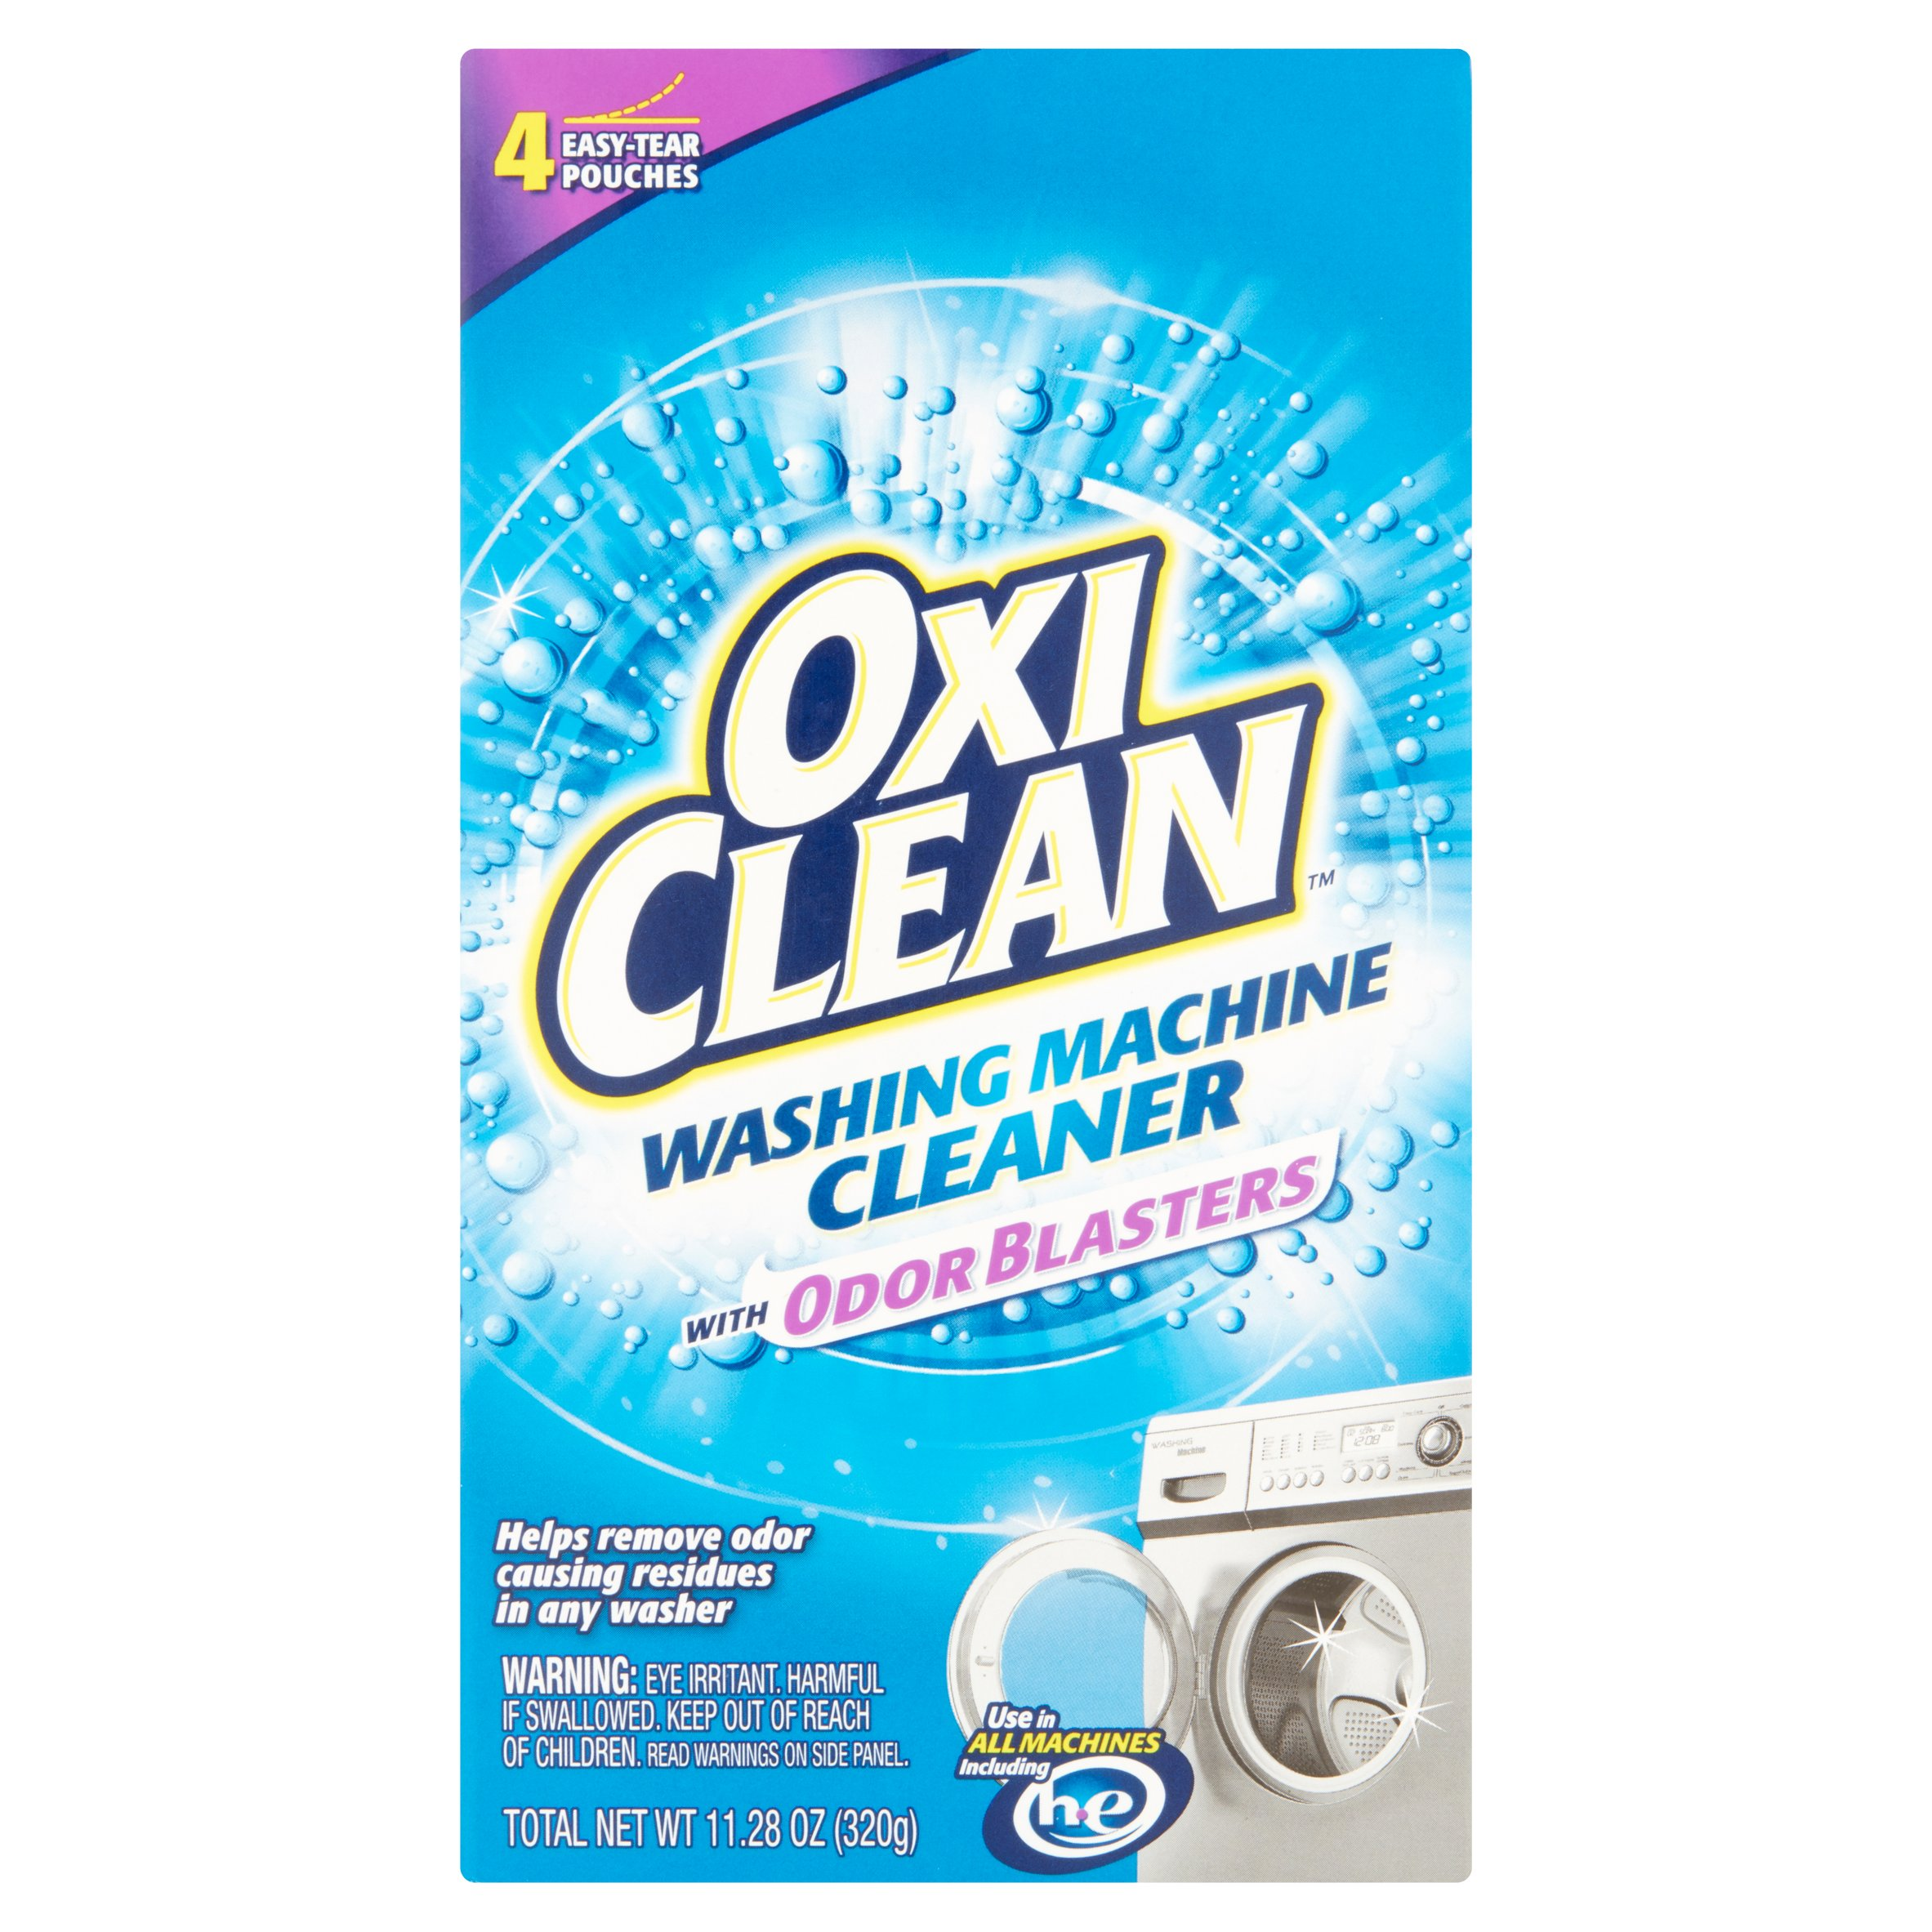 OxiClean Washing Machine Cleaner, 4 Count - Walmart.com